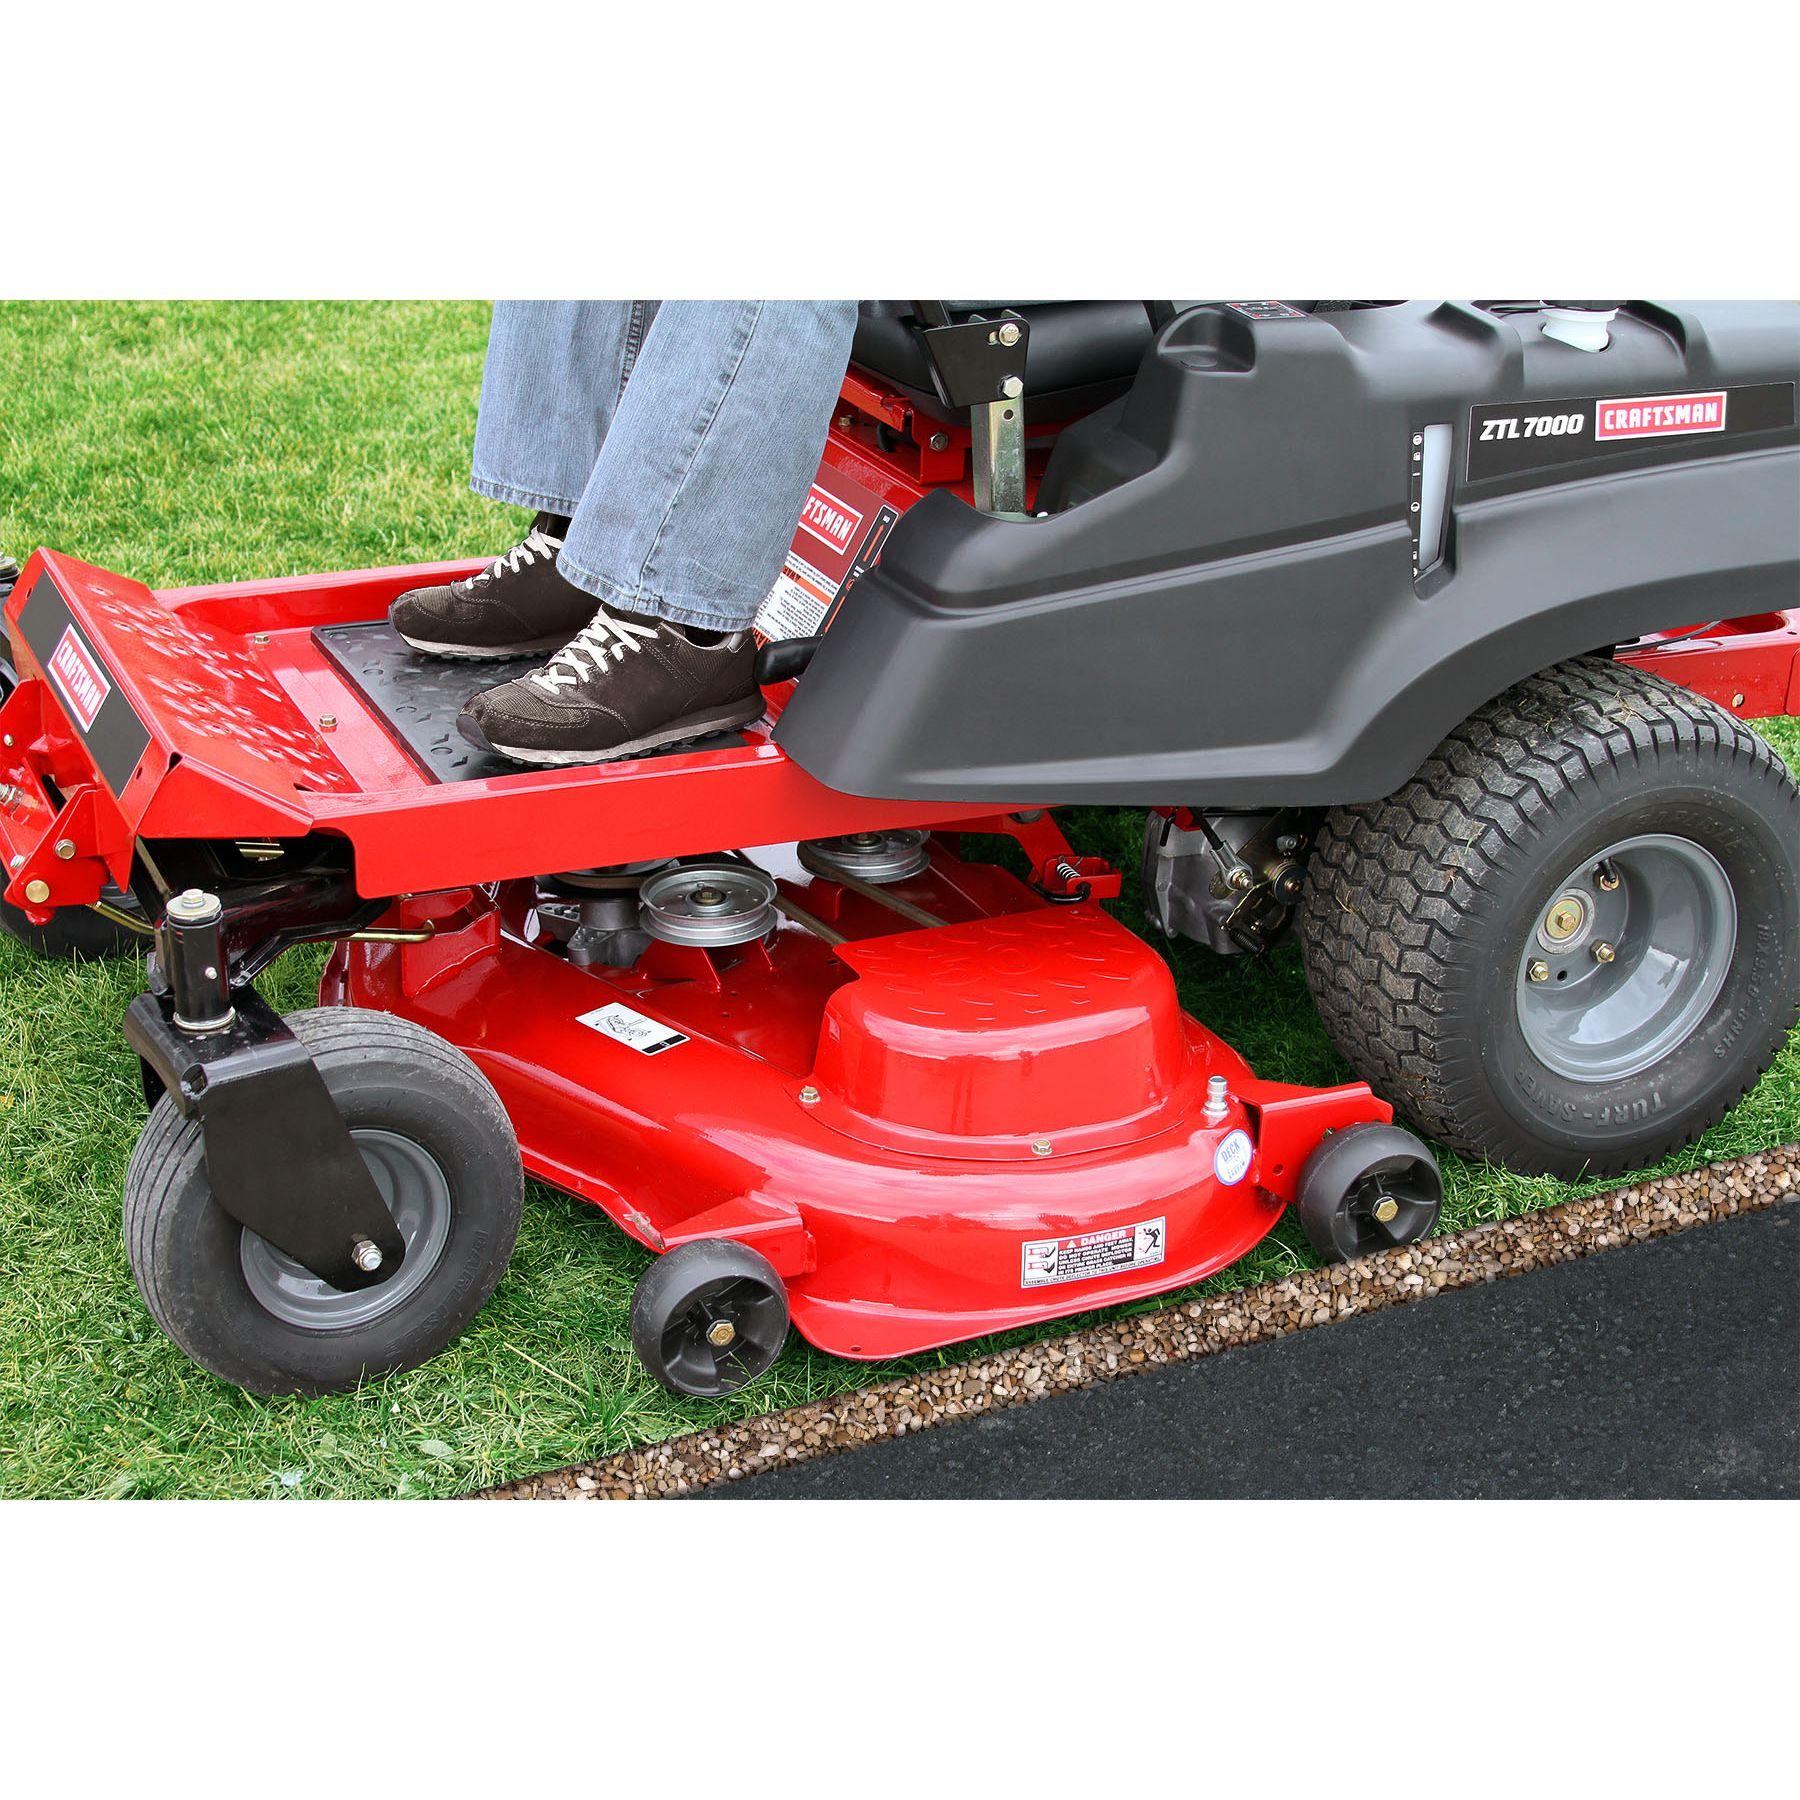 "Craftsman 26 HP* V-Twin 50"" Zero-Turn Riding Mower 49 States"